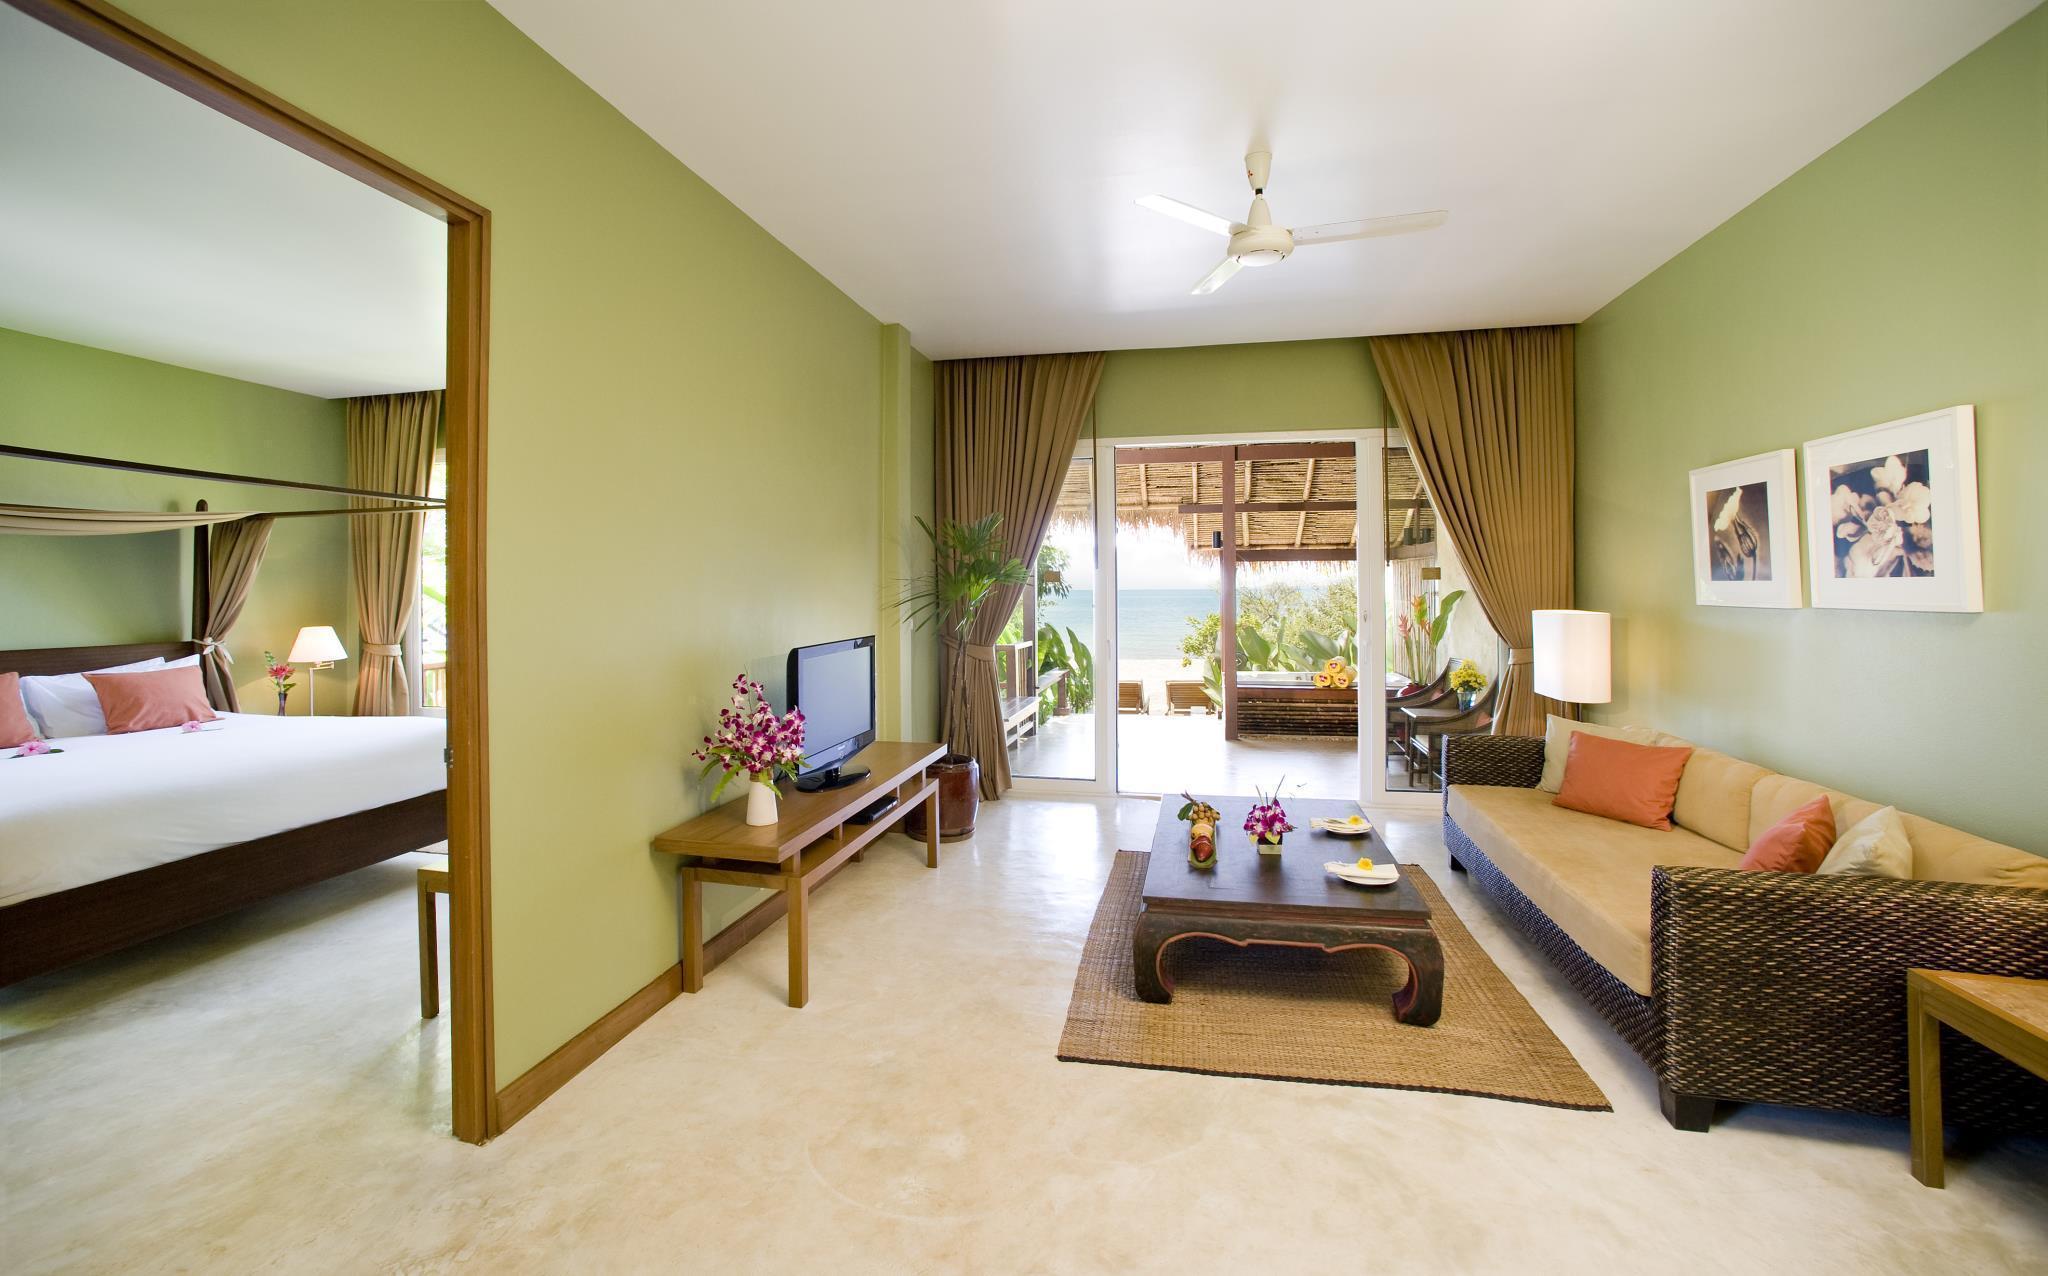 Centara Chaan Talay Resort & Villas เซ็นทารา ชานทะเล รีสอร์ท แอนด์ วิลลา